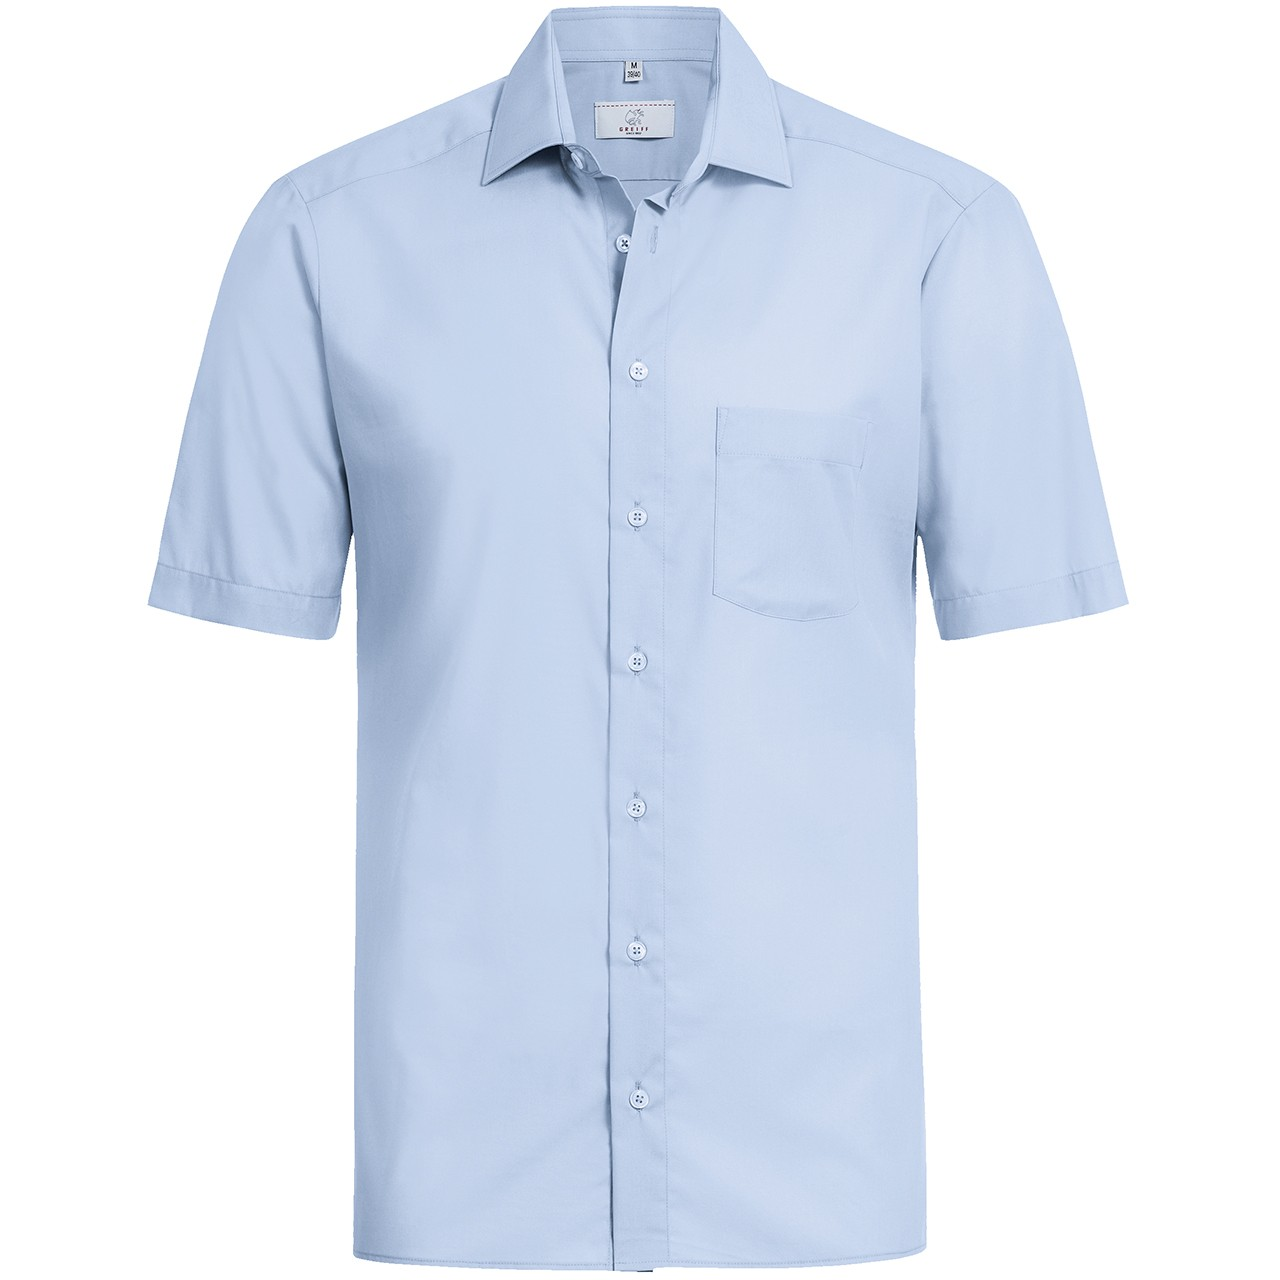 Basic Hemd Kurzarm Regular Fit Greiff®   bedrucken, besticken, bedrucken lassen, besticken lassen, mit Logo  